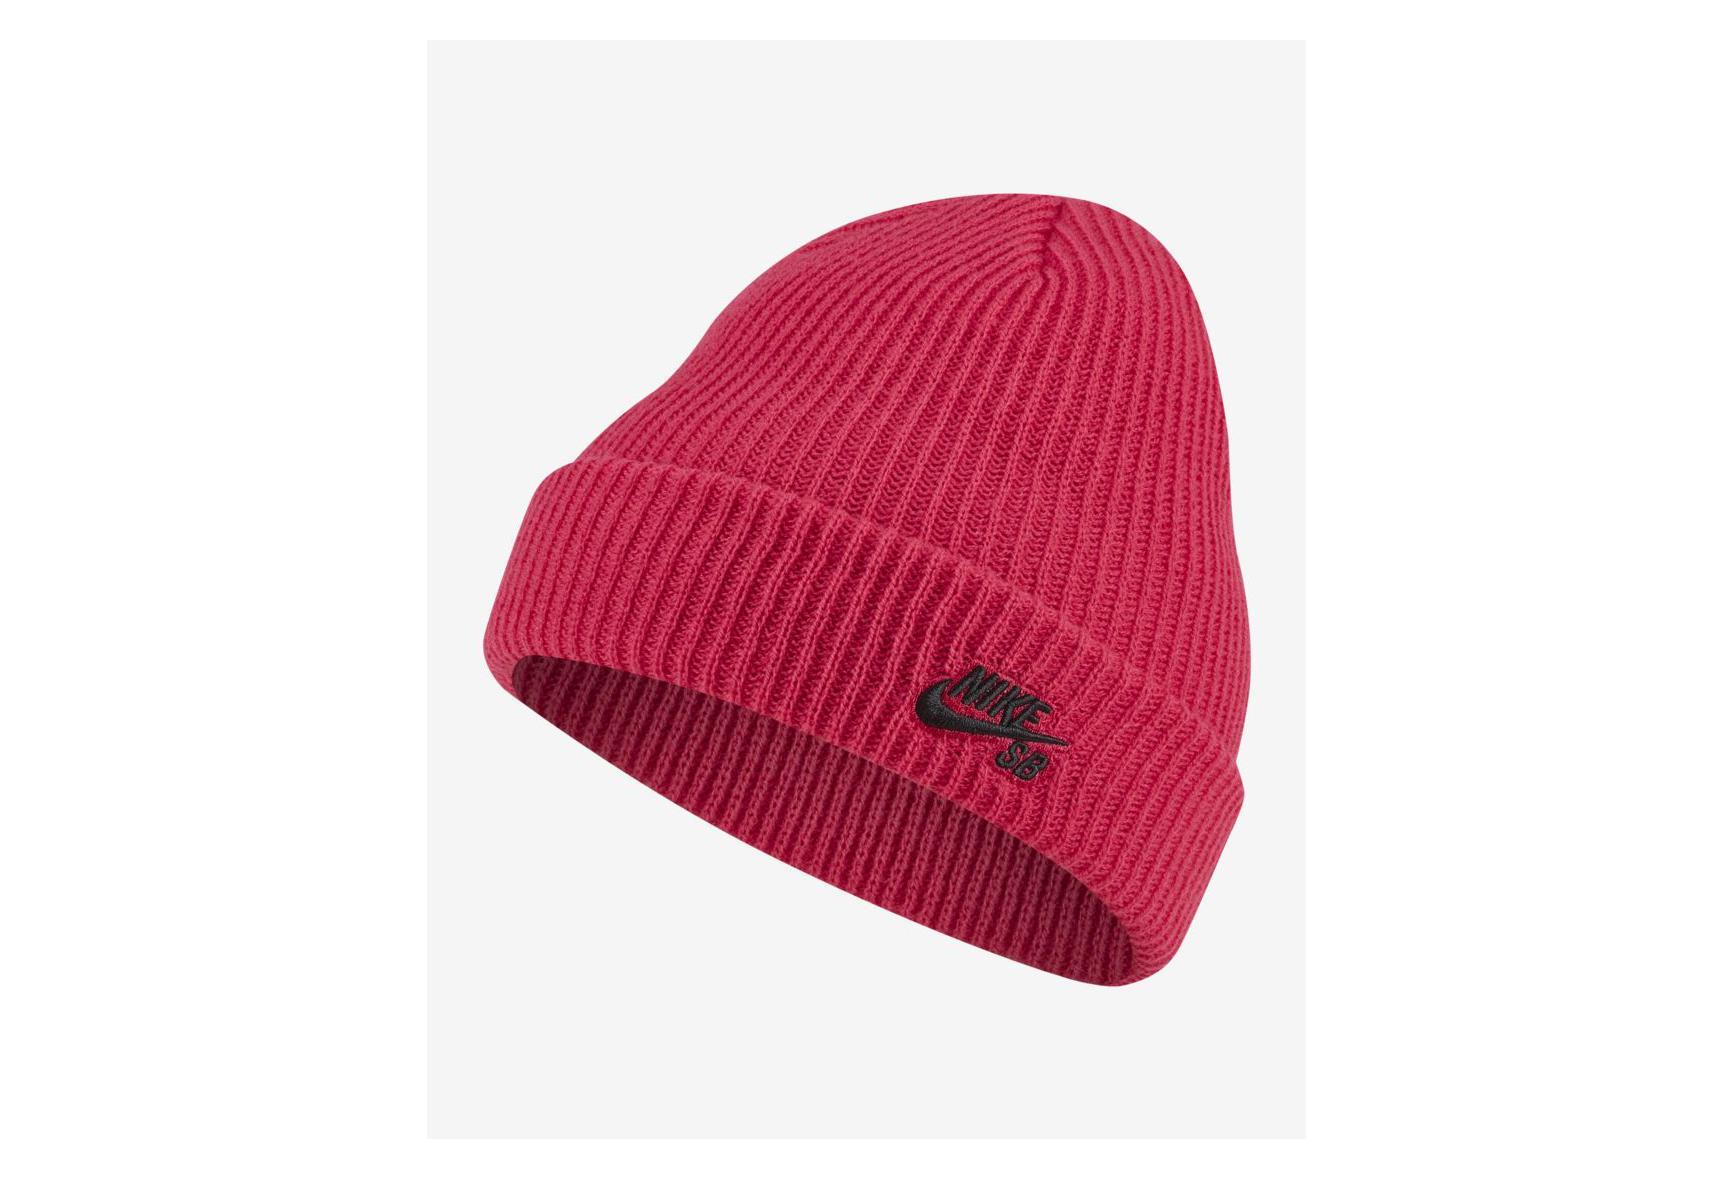 277b2f4701be7 Nike SB Fisherman Cap Pink   Black